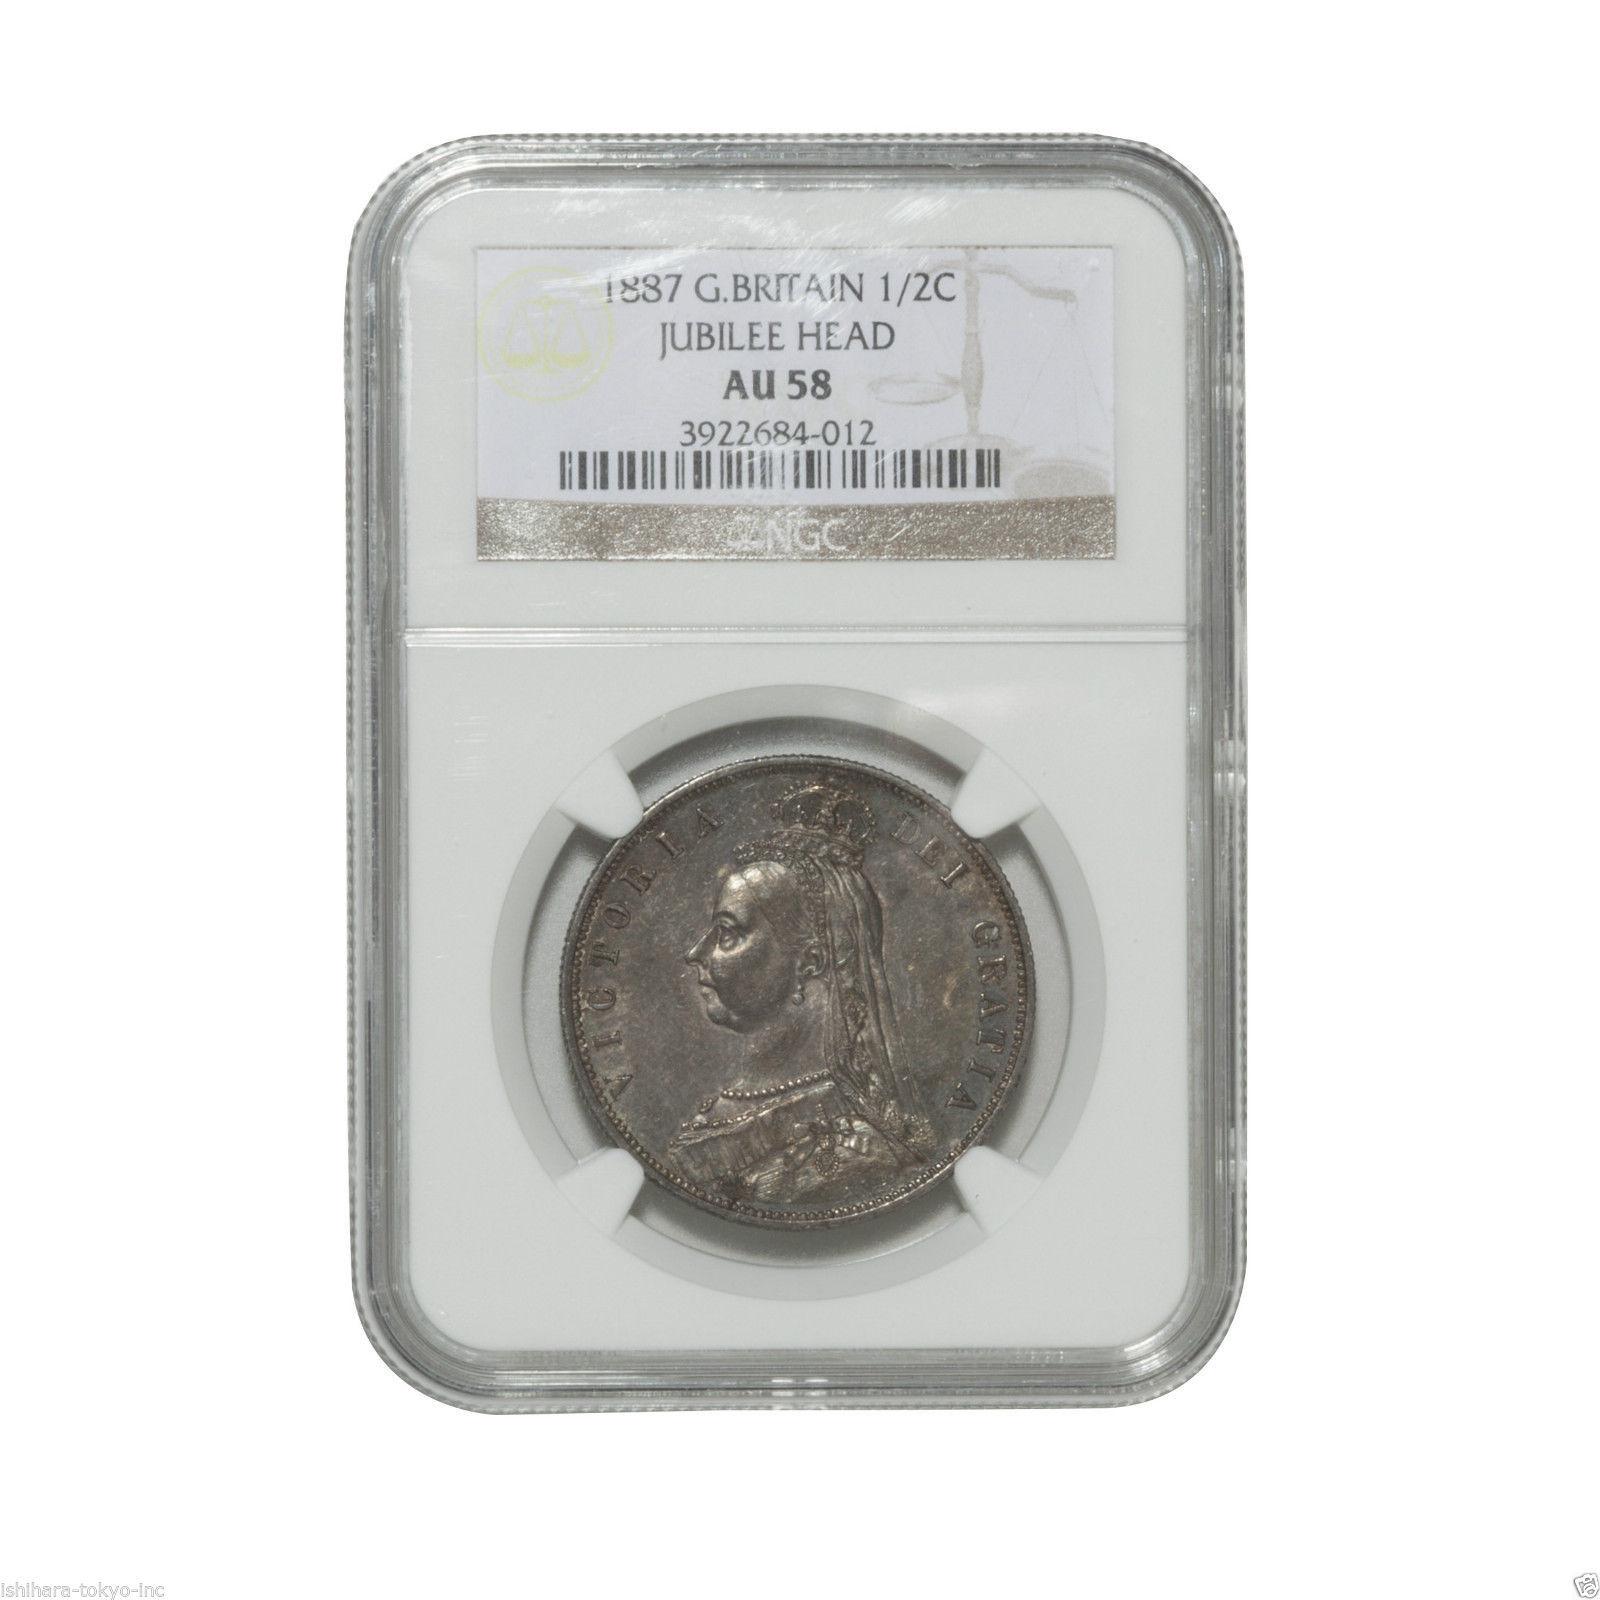 Großbritannien : 1/2C JUBILEE HEAD 1887 - AU58 NGC - Antike Silbermünze